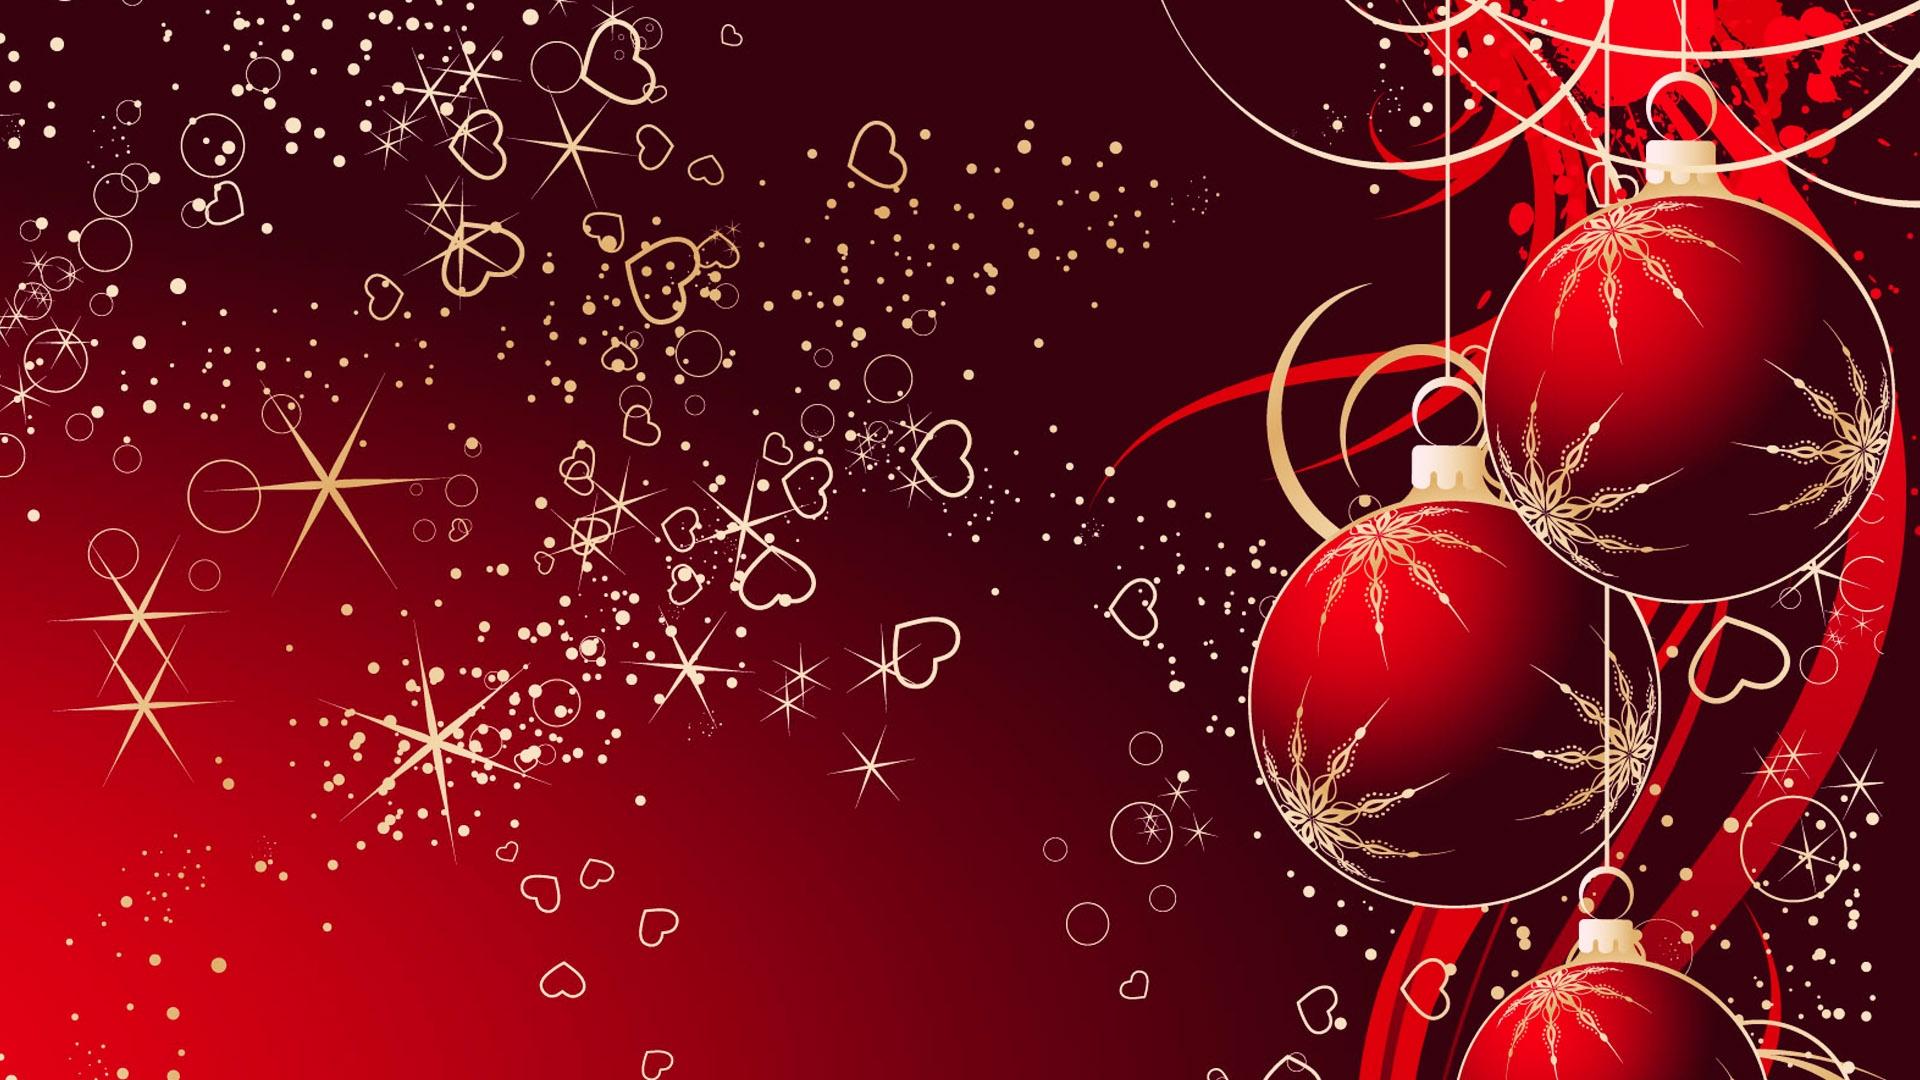 9 98927 christmas wallpaper hd for desktop chignahuapan